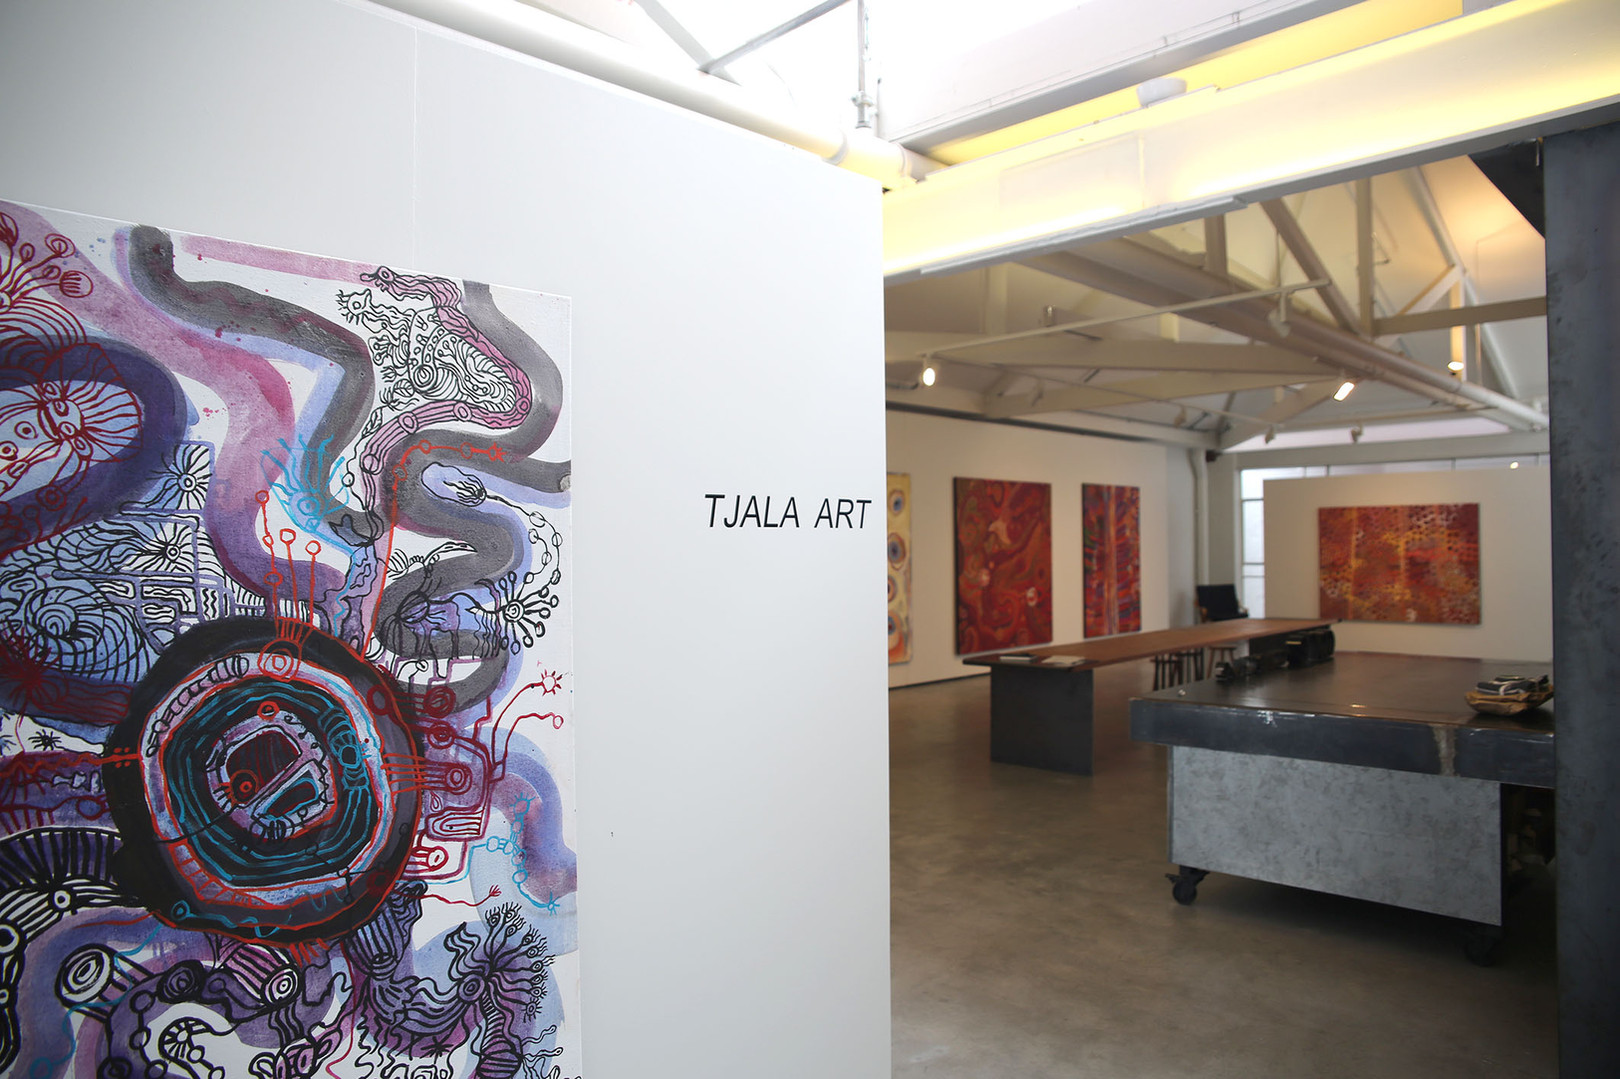 Tjala Art